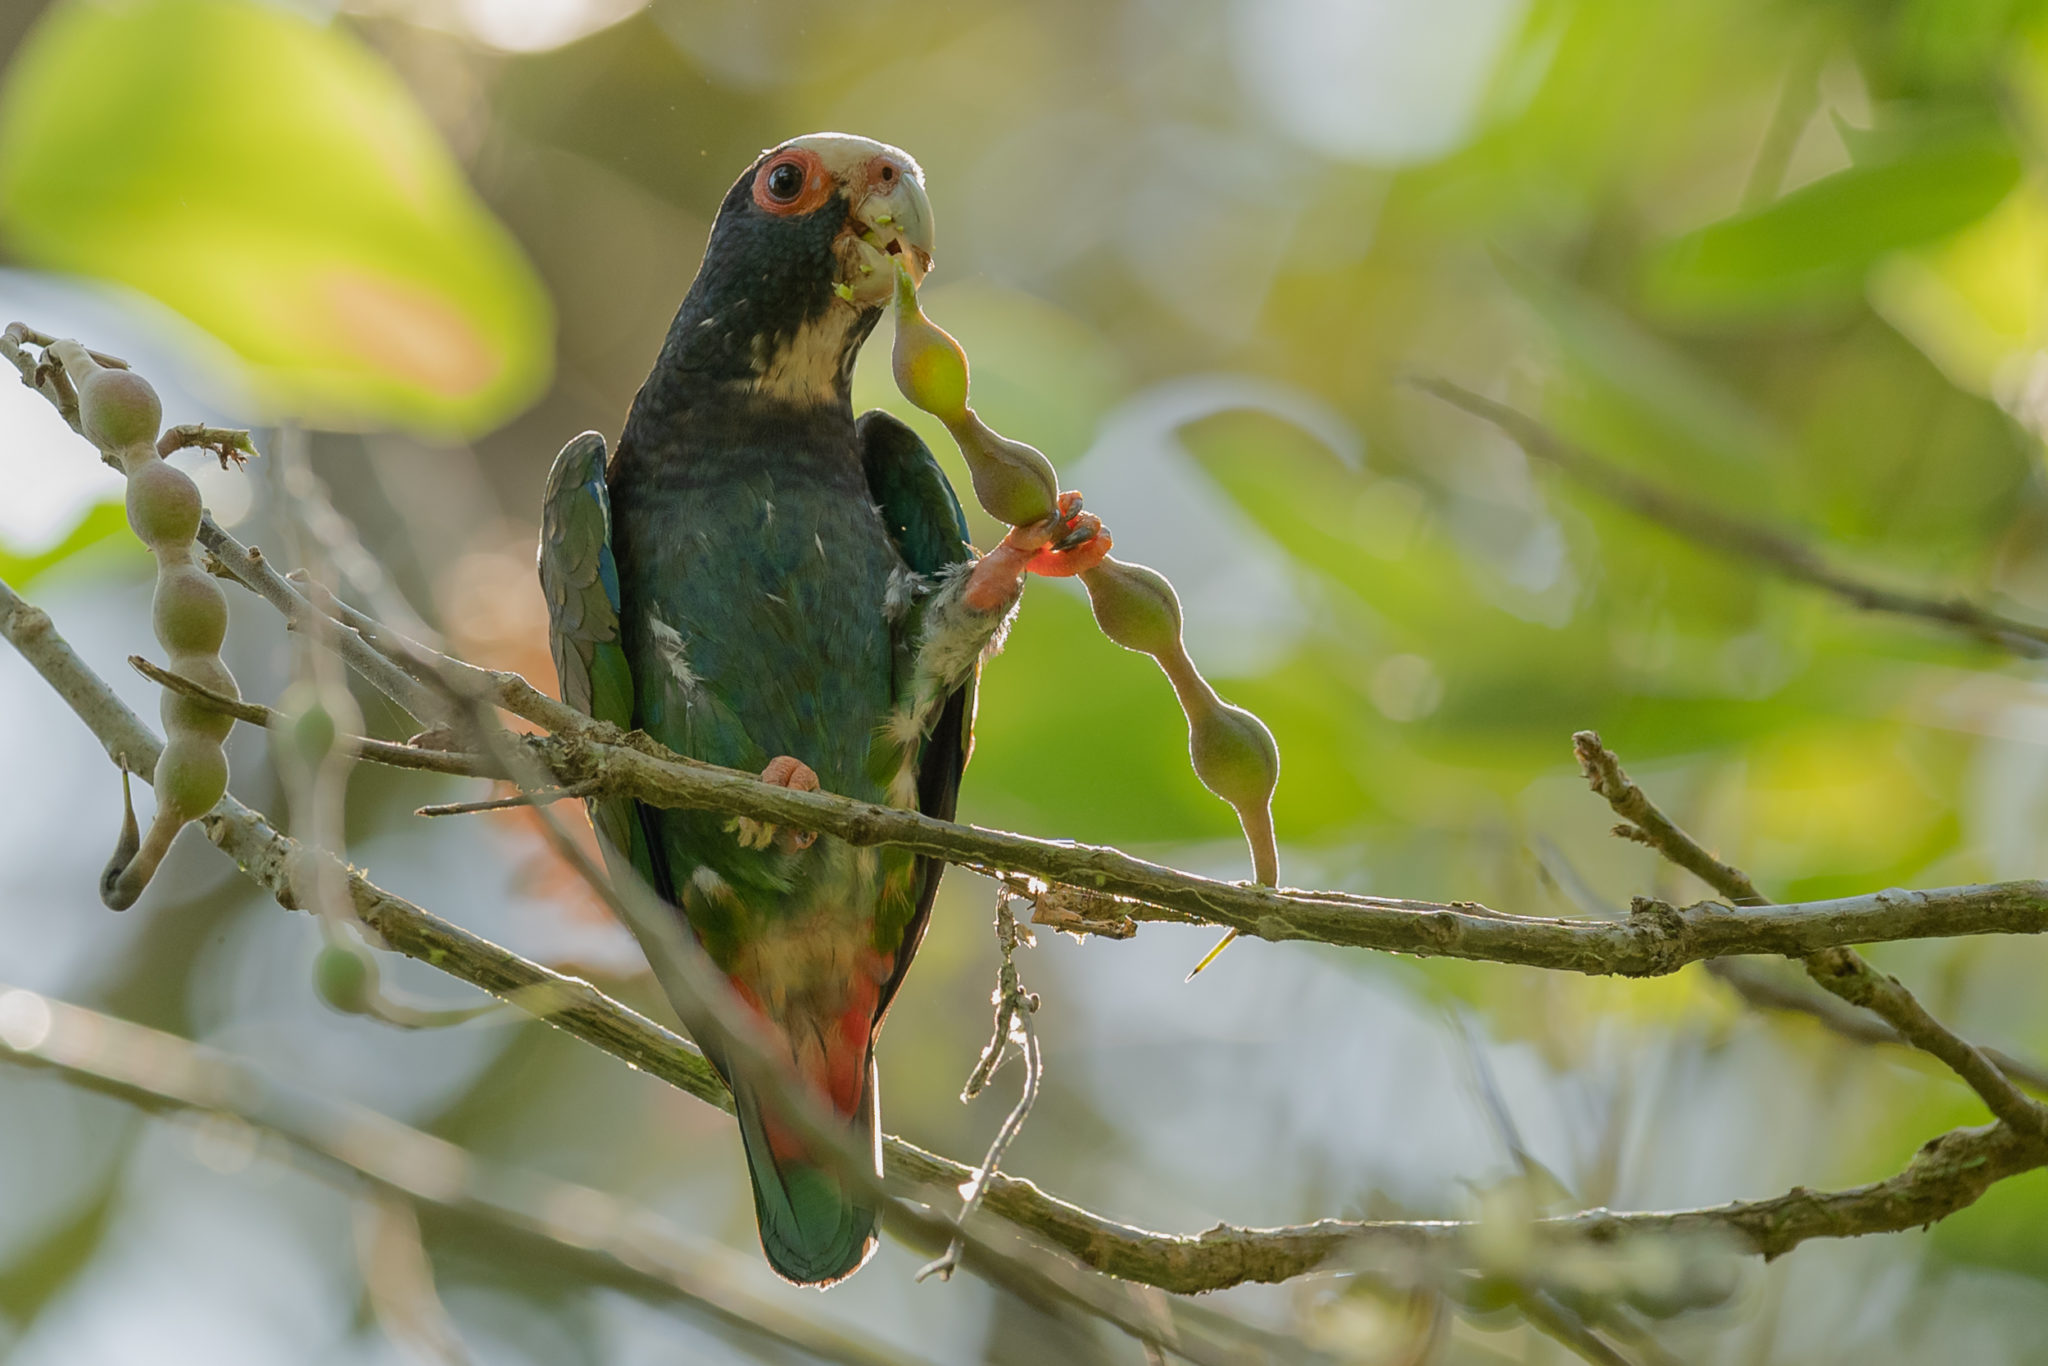 Weißkopfpapagei (Pionus senilis)